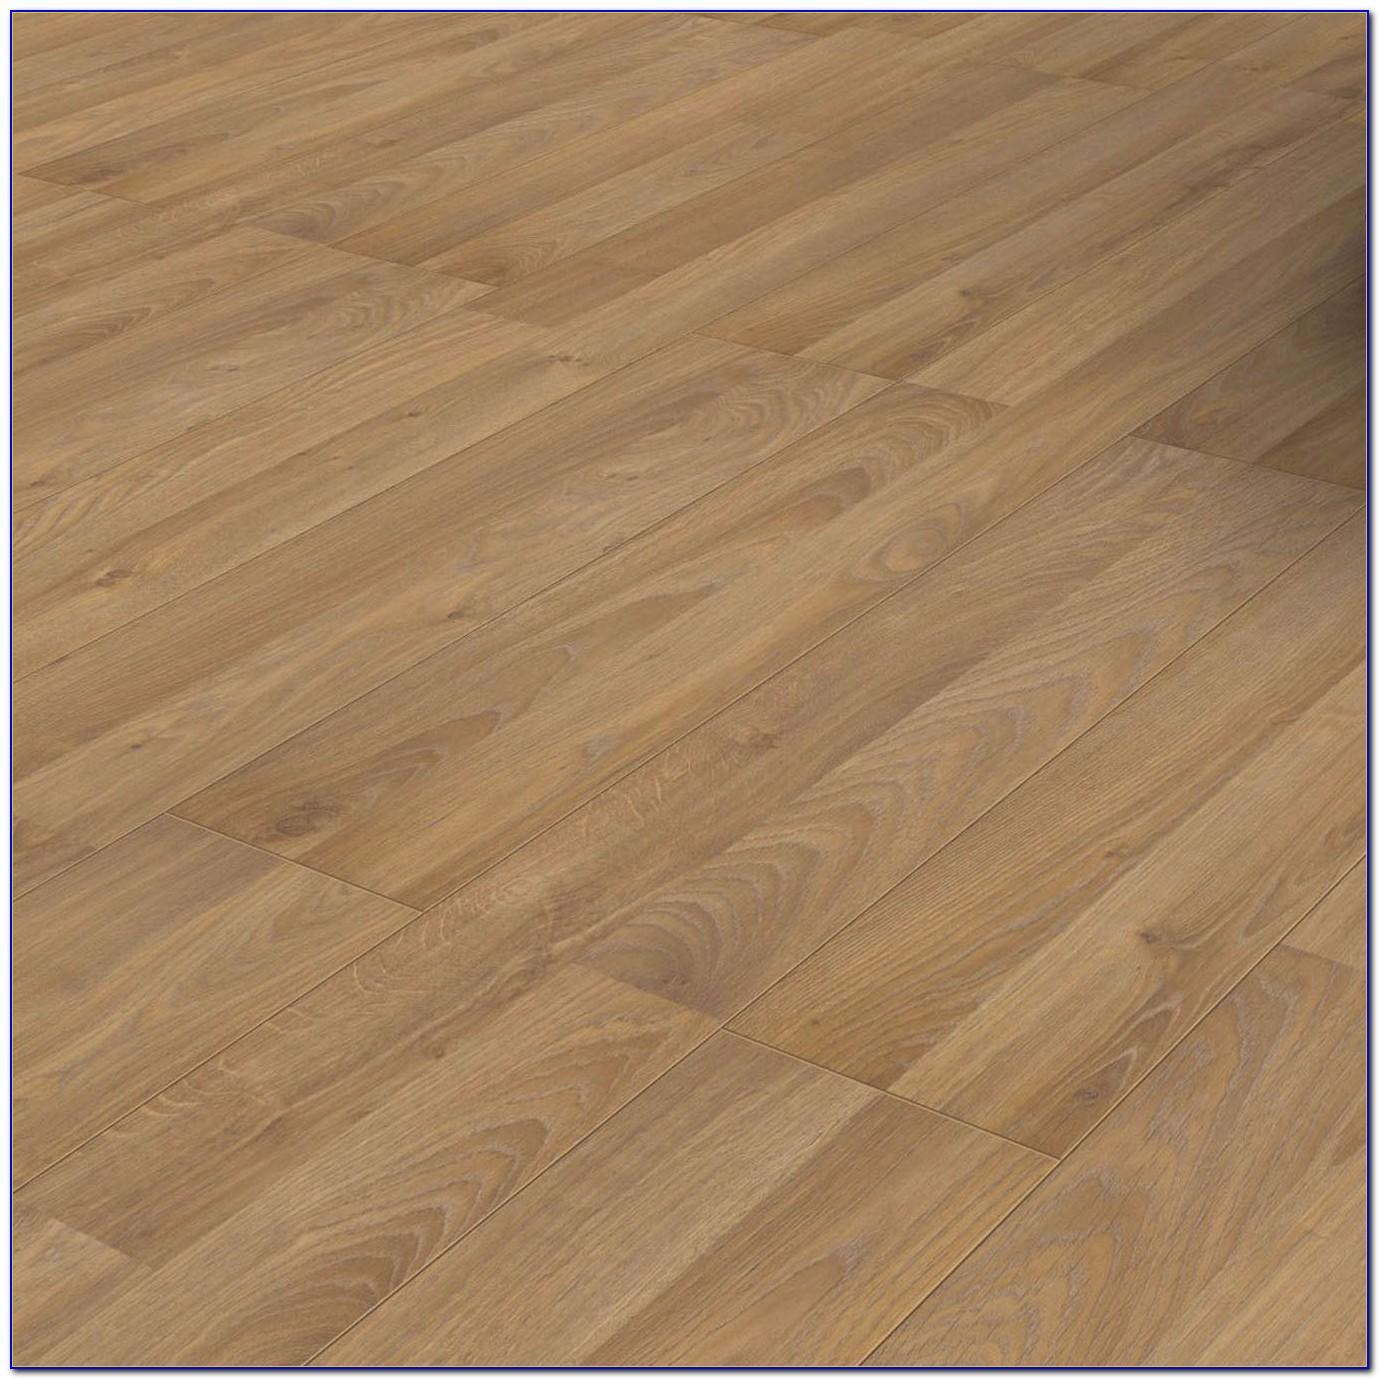 Golden Select Oak Laminate Flooring